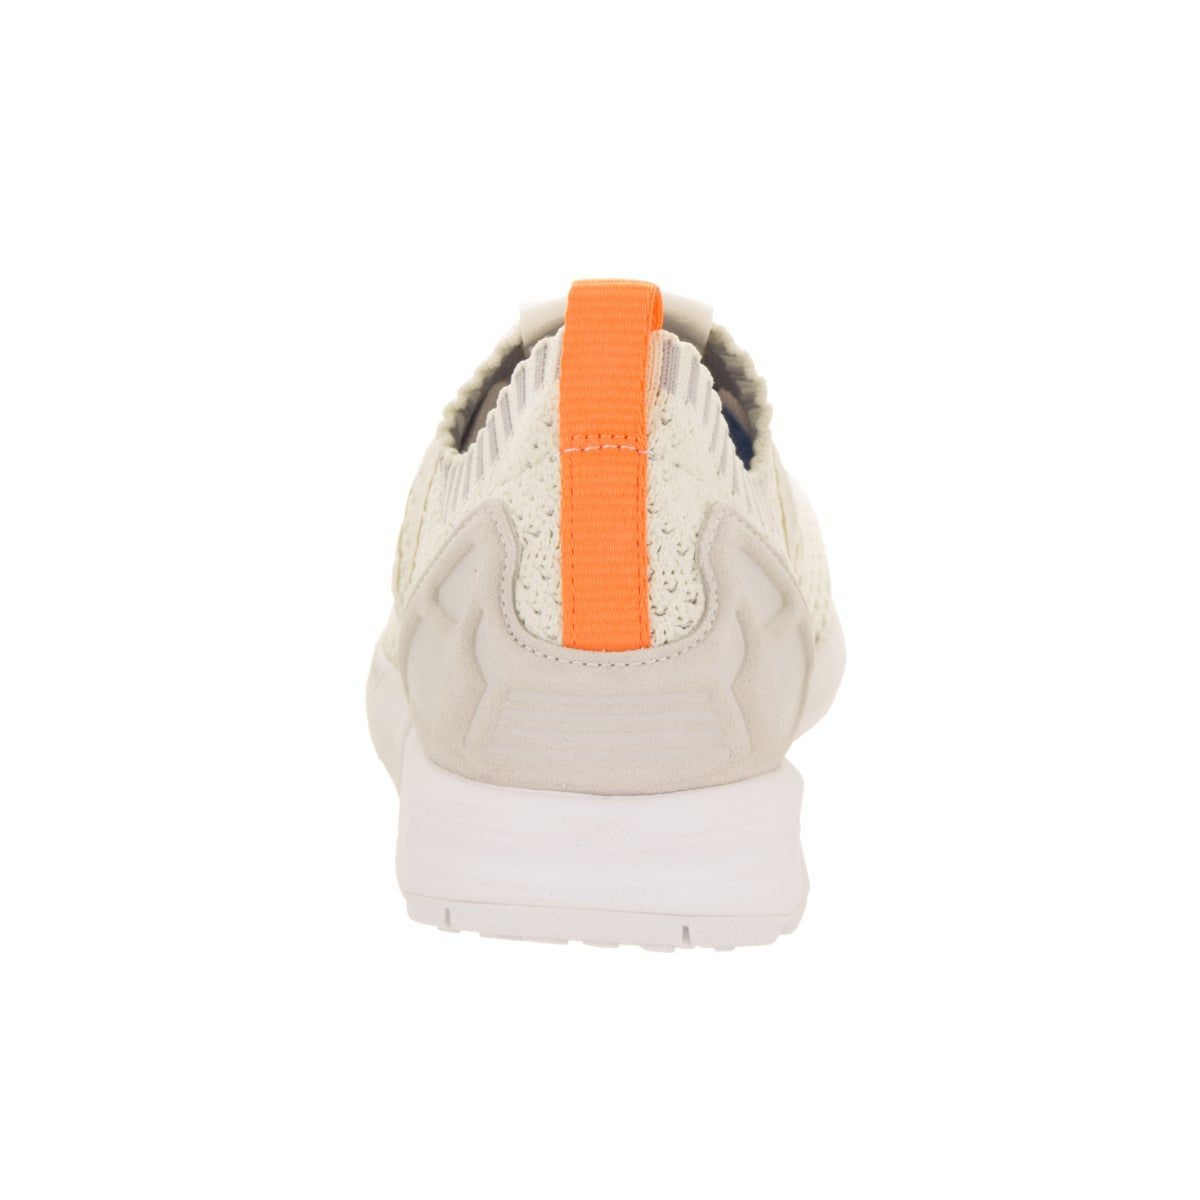 c4ae89d4b8492 Shop Adidas Women s ZX Flux Pk Running Shoe - Free Shipping Today -  Overstock.com - 15858337